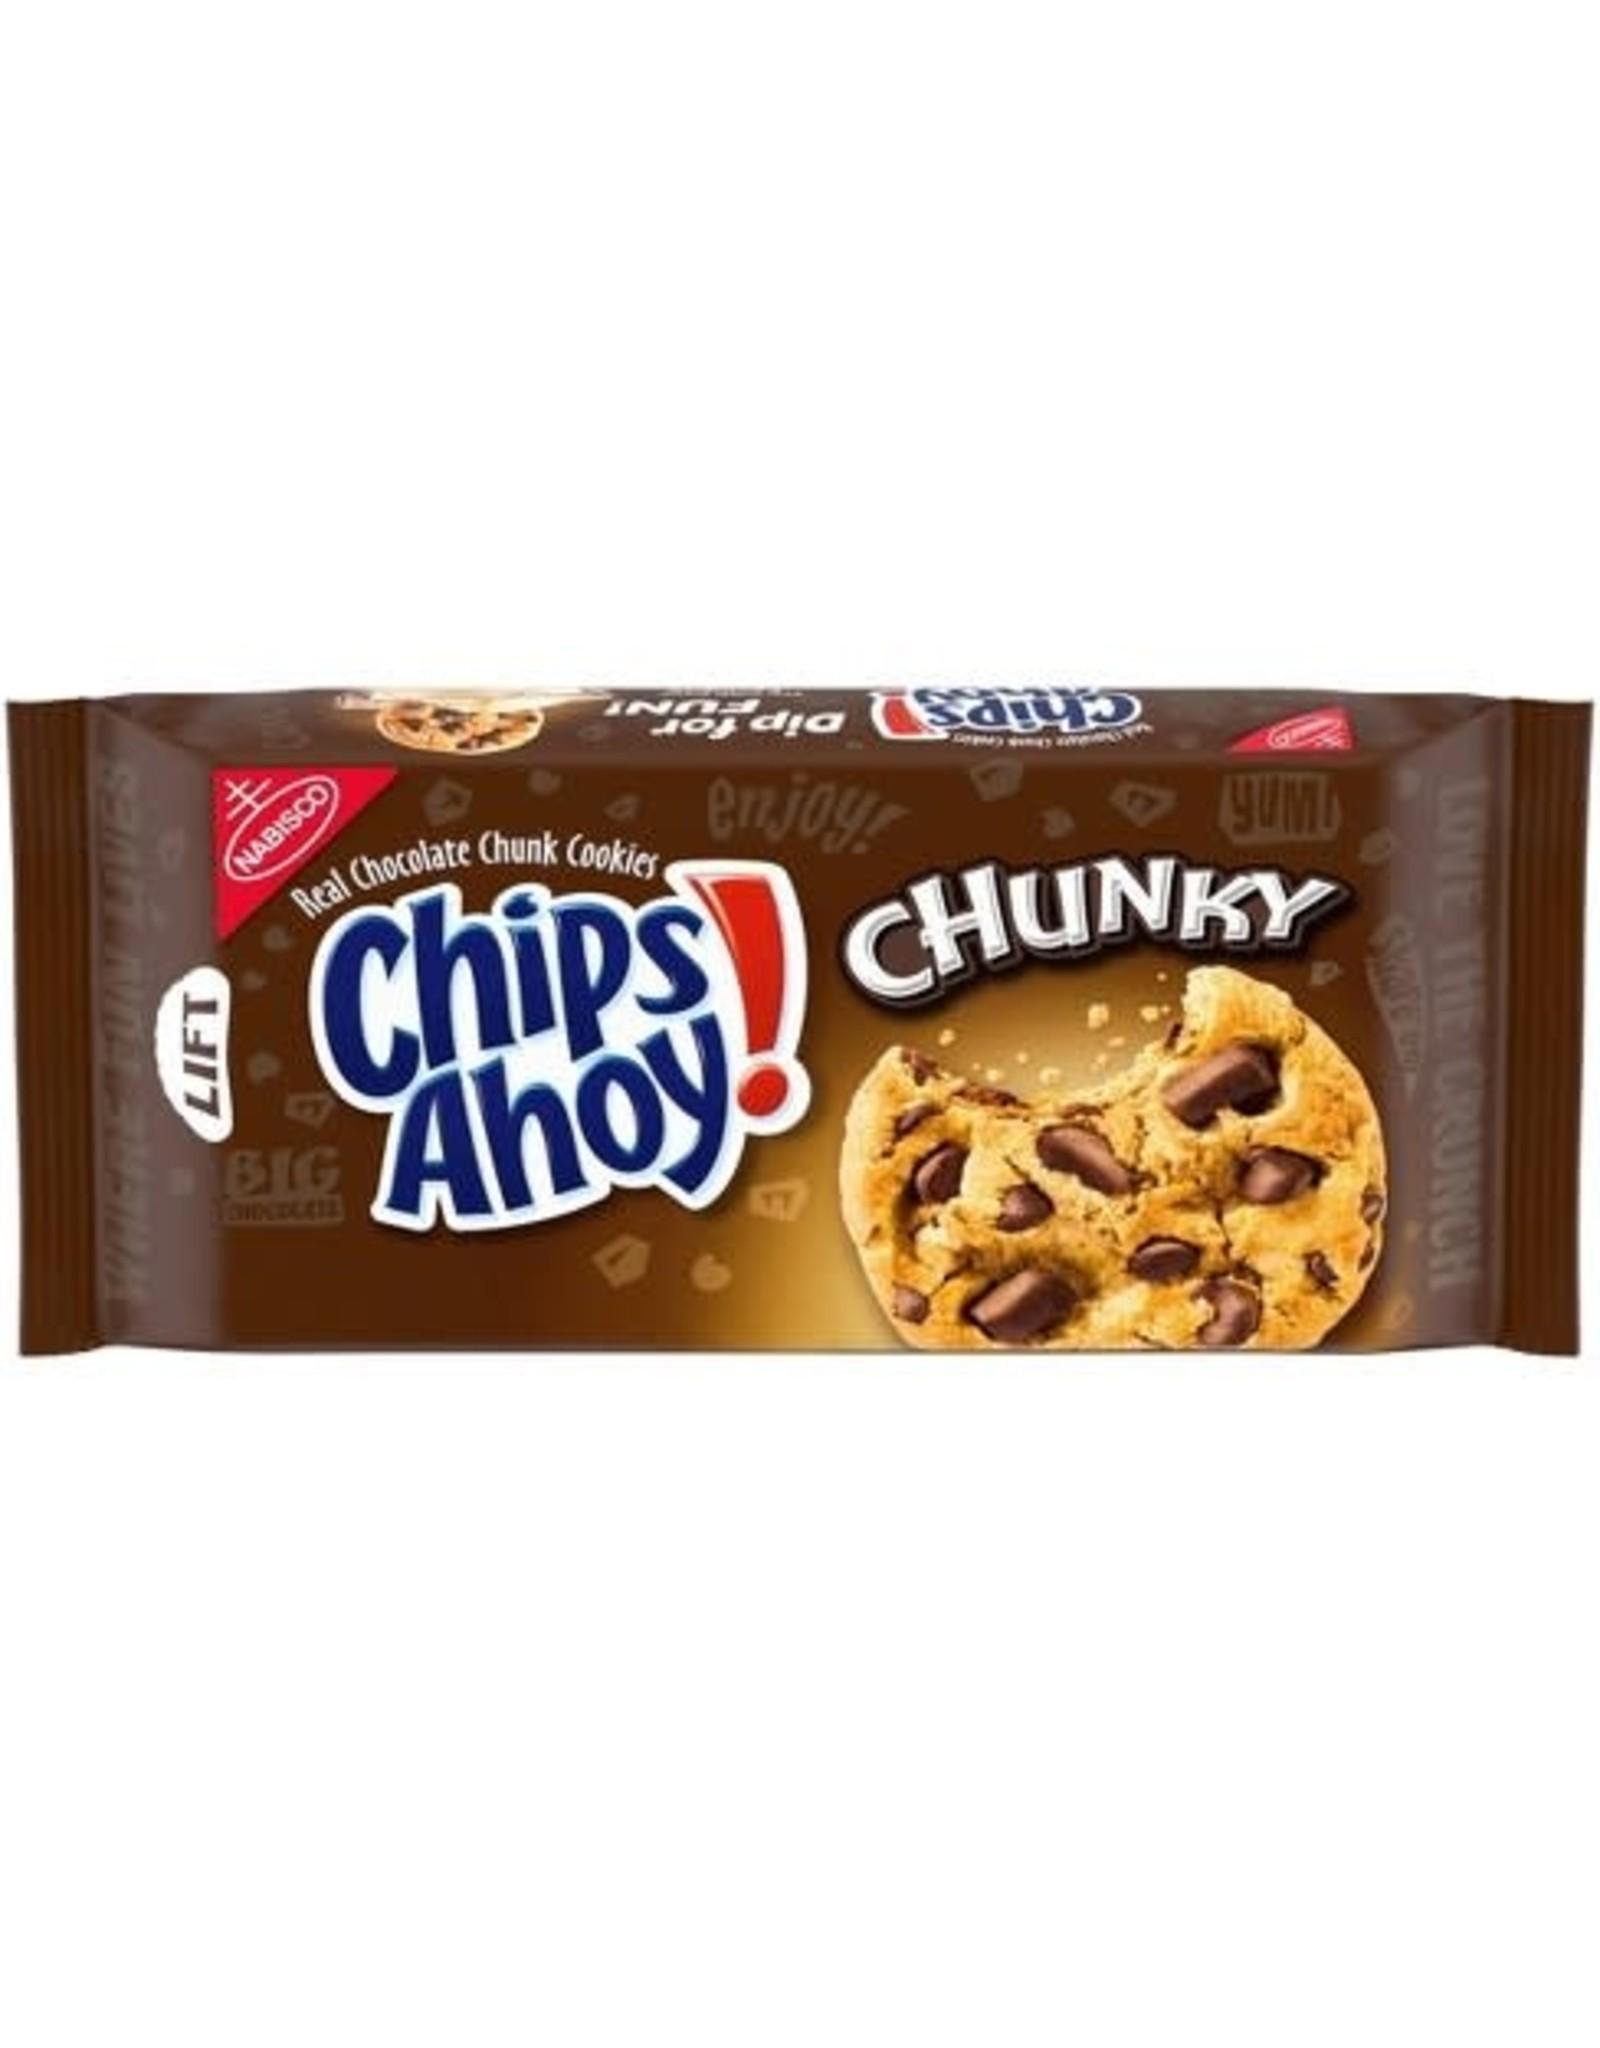 Chips Ahoy! Chunky - Real Chocolate Chunck Cookies - 333g